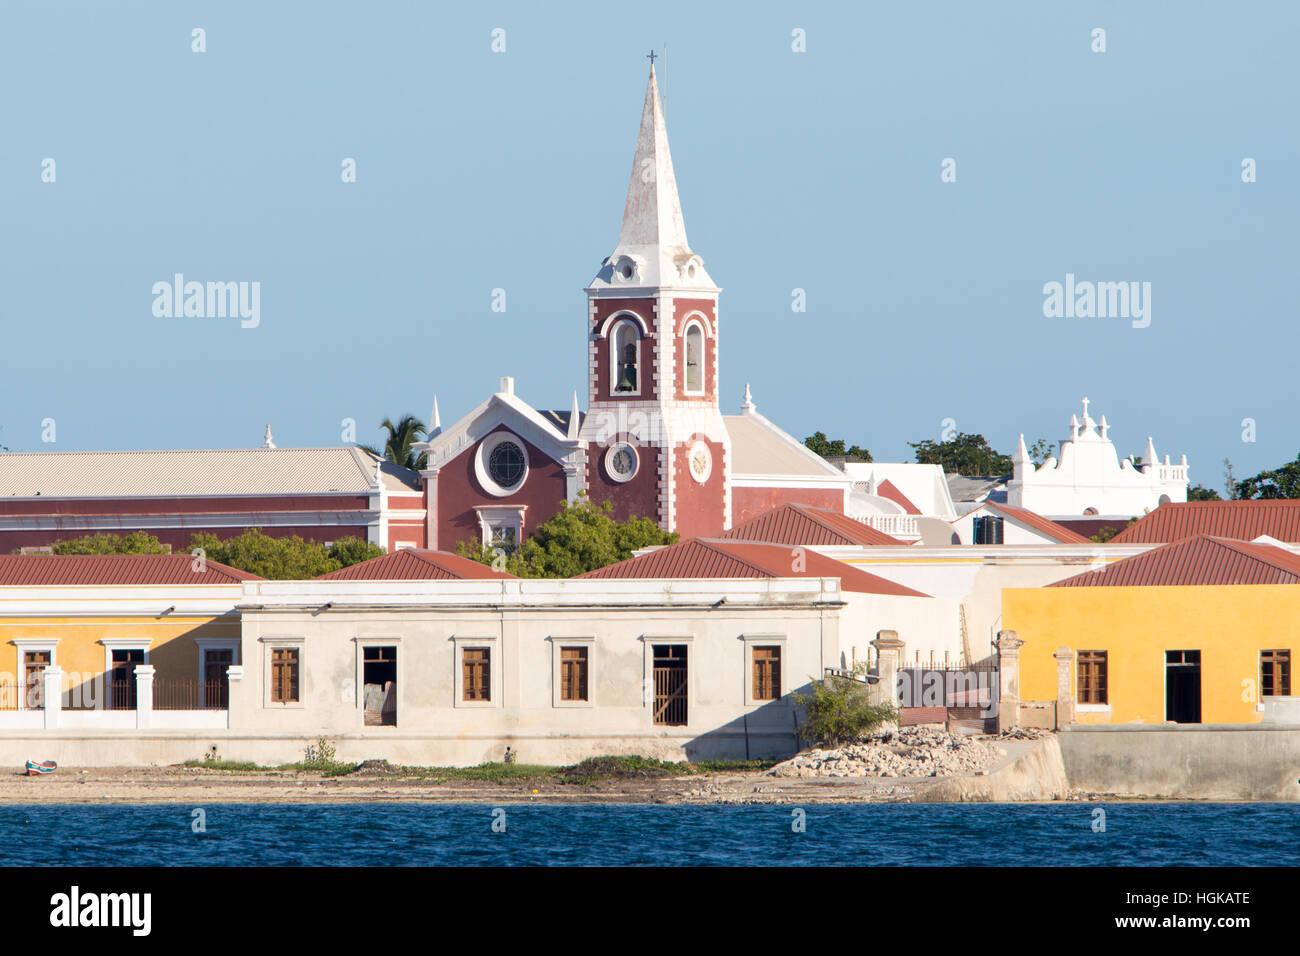 Mozambique Island (Ilha de Mocambique), Mozambique - Stock Image